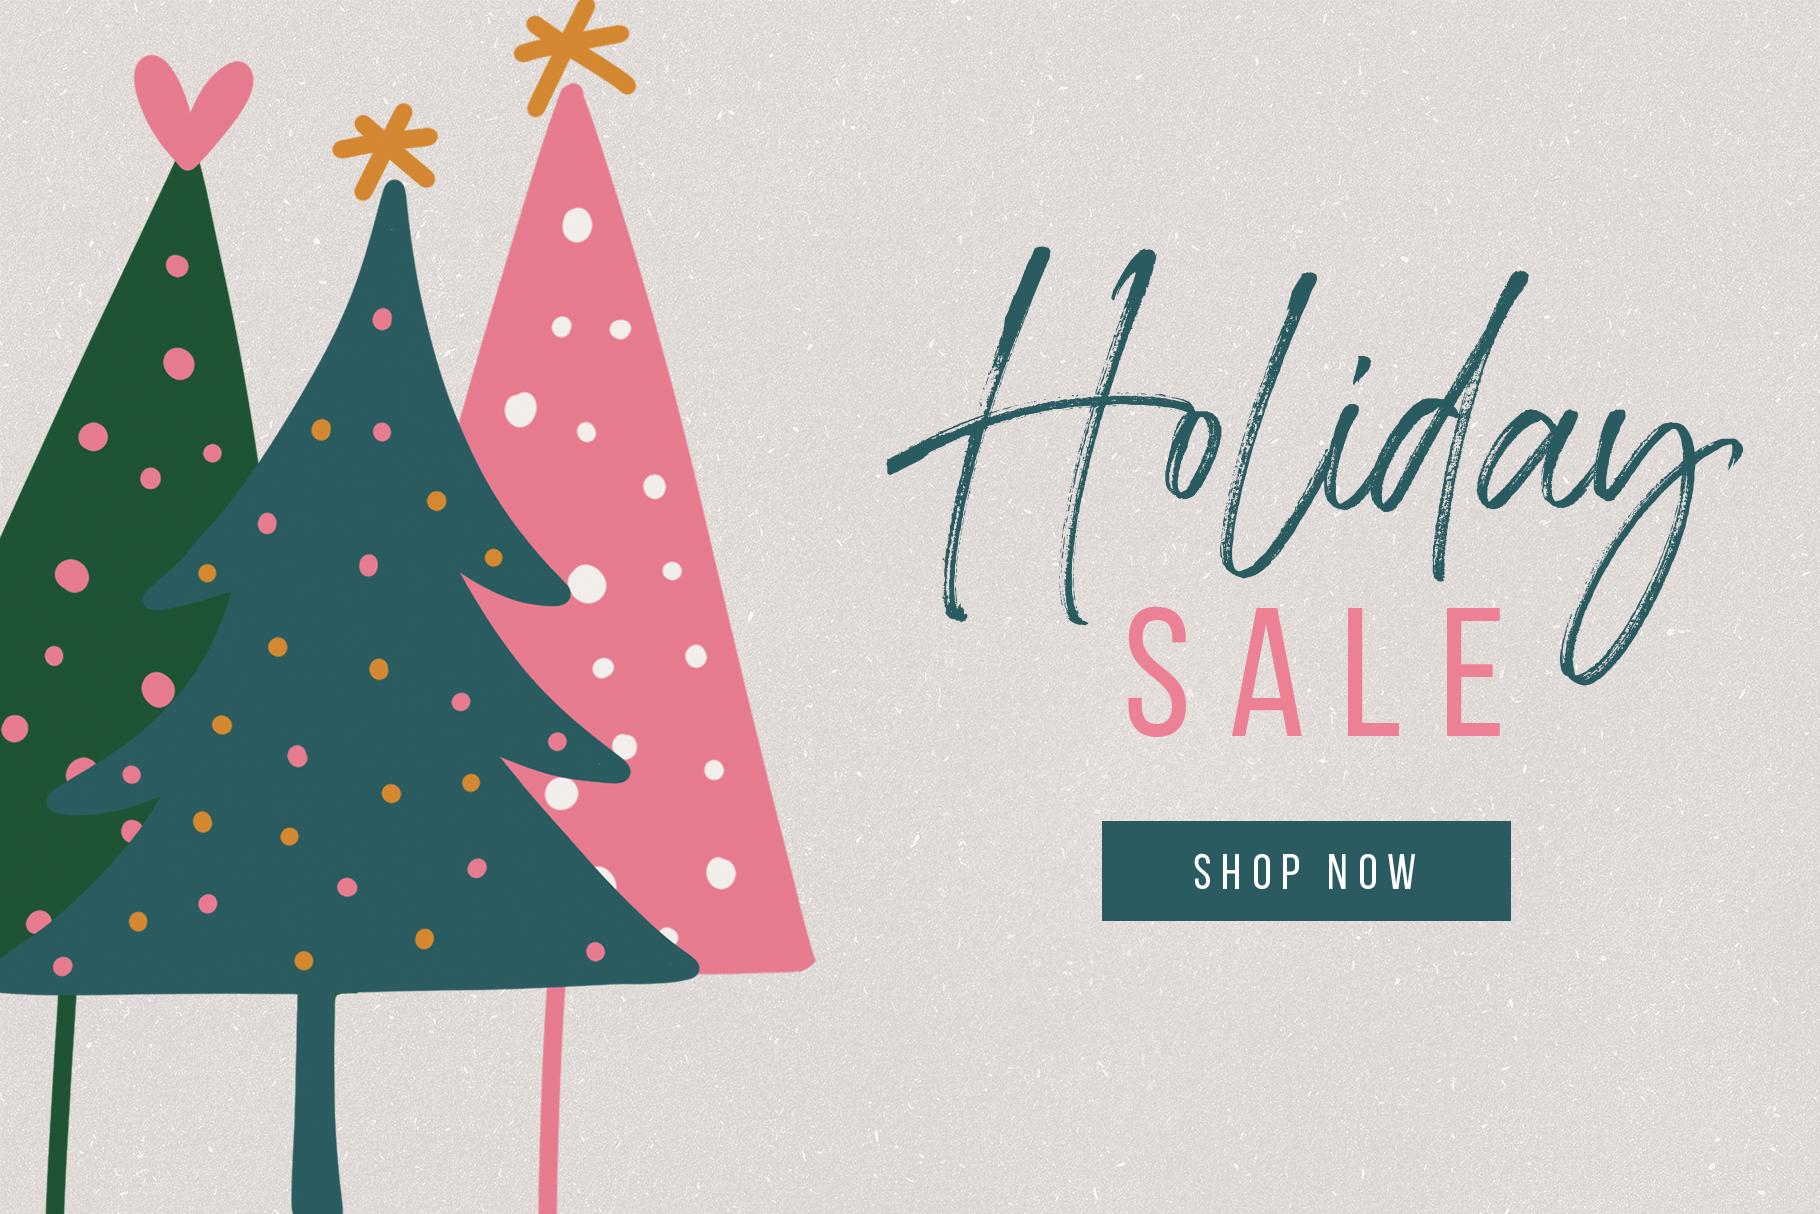 Messy And Modern Christmas Tree Illustrations By Ka Designs